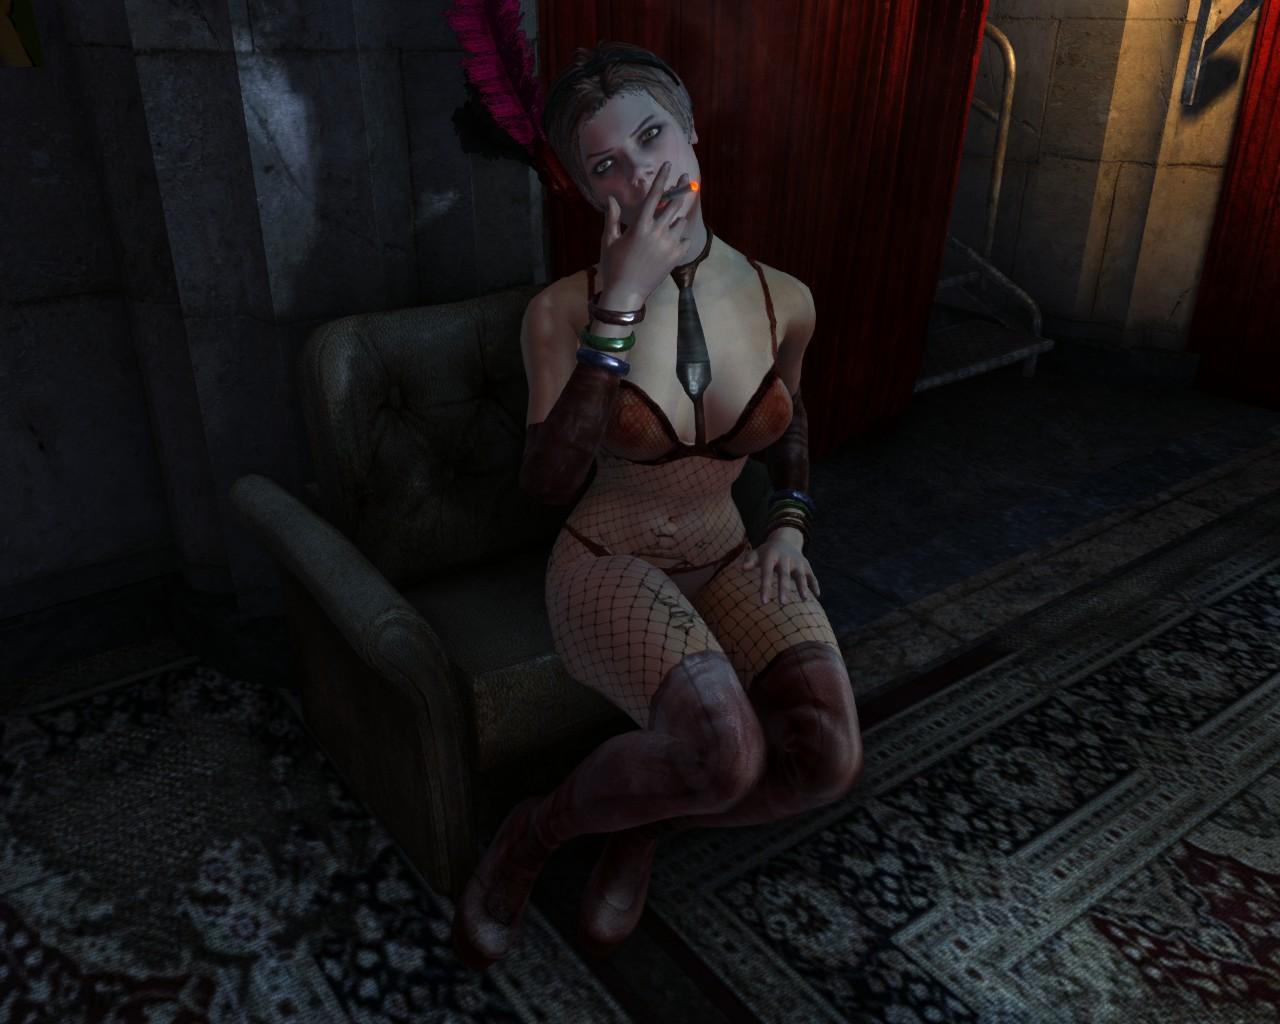 геи порно секс в метро